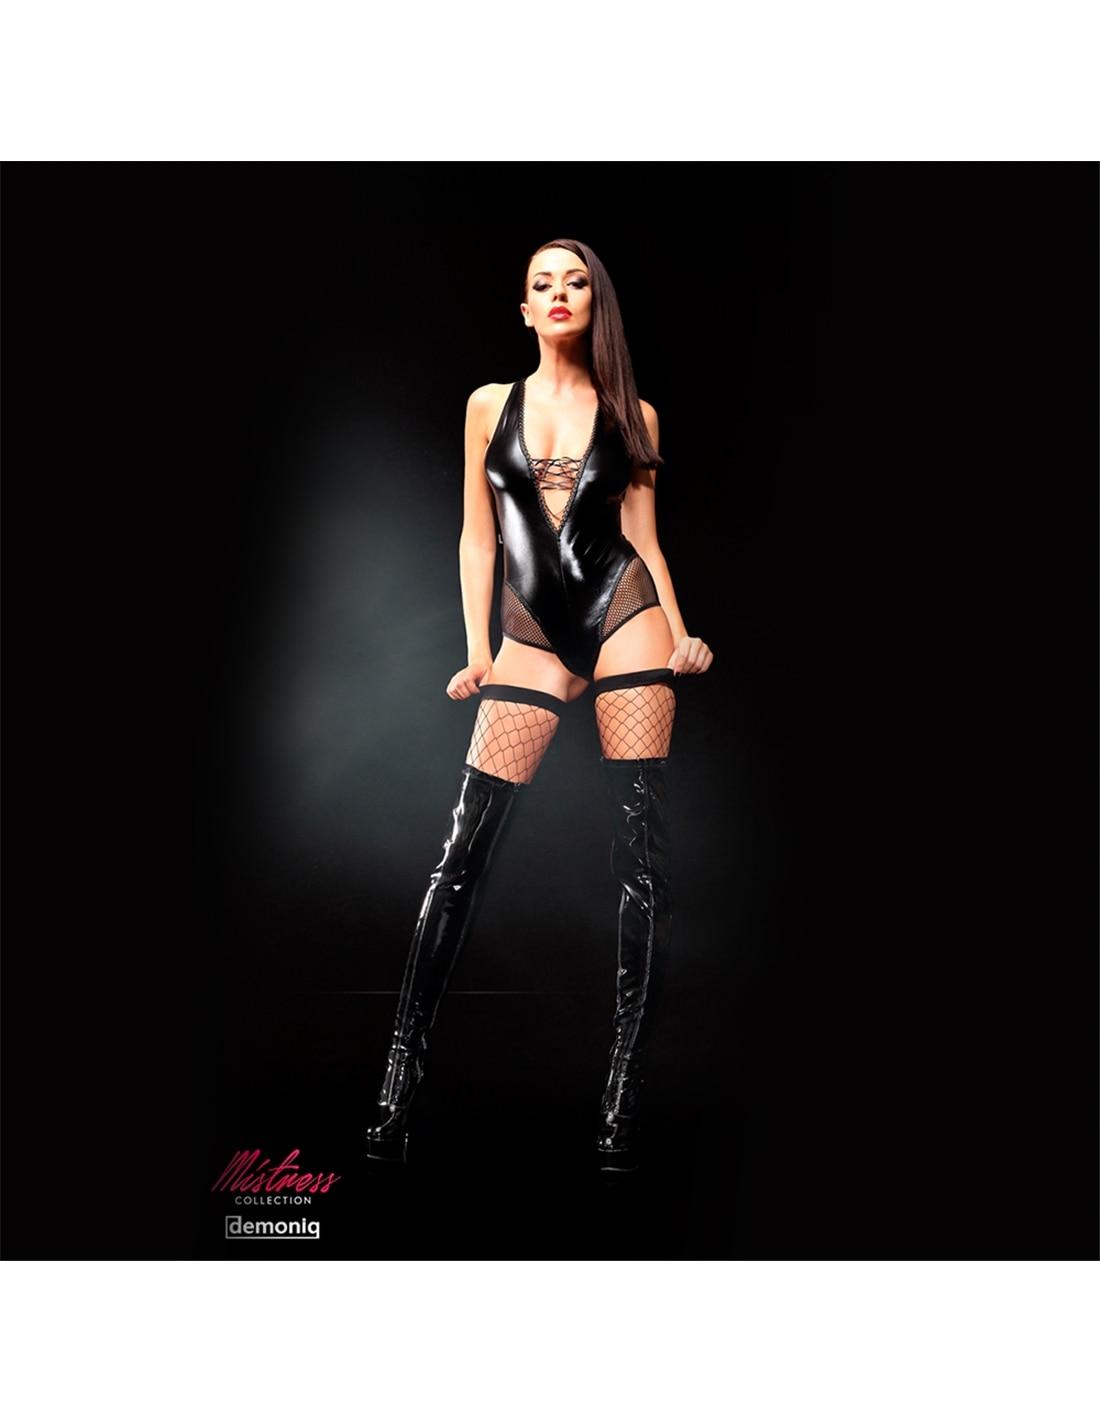 Body Claudia Premium Demoniq Mistress Collection - 36-38 S/M - PR2010340470